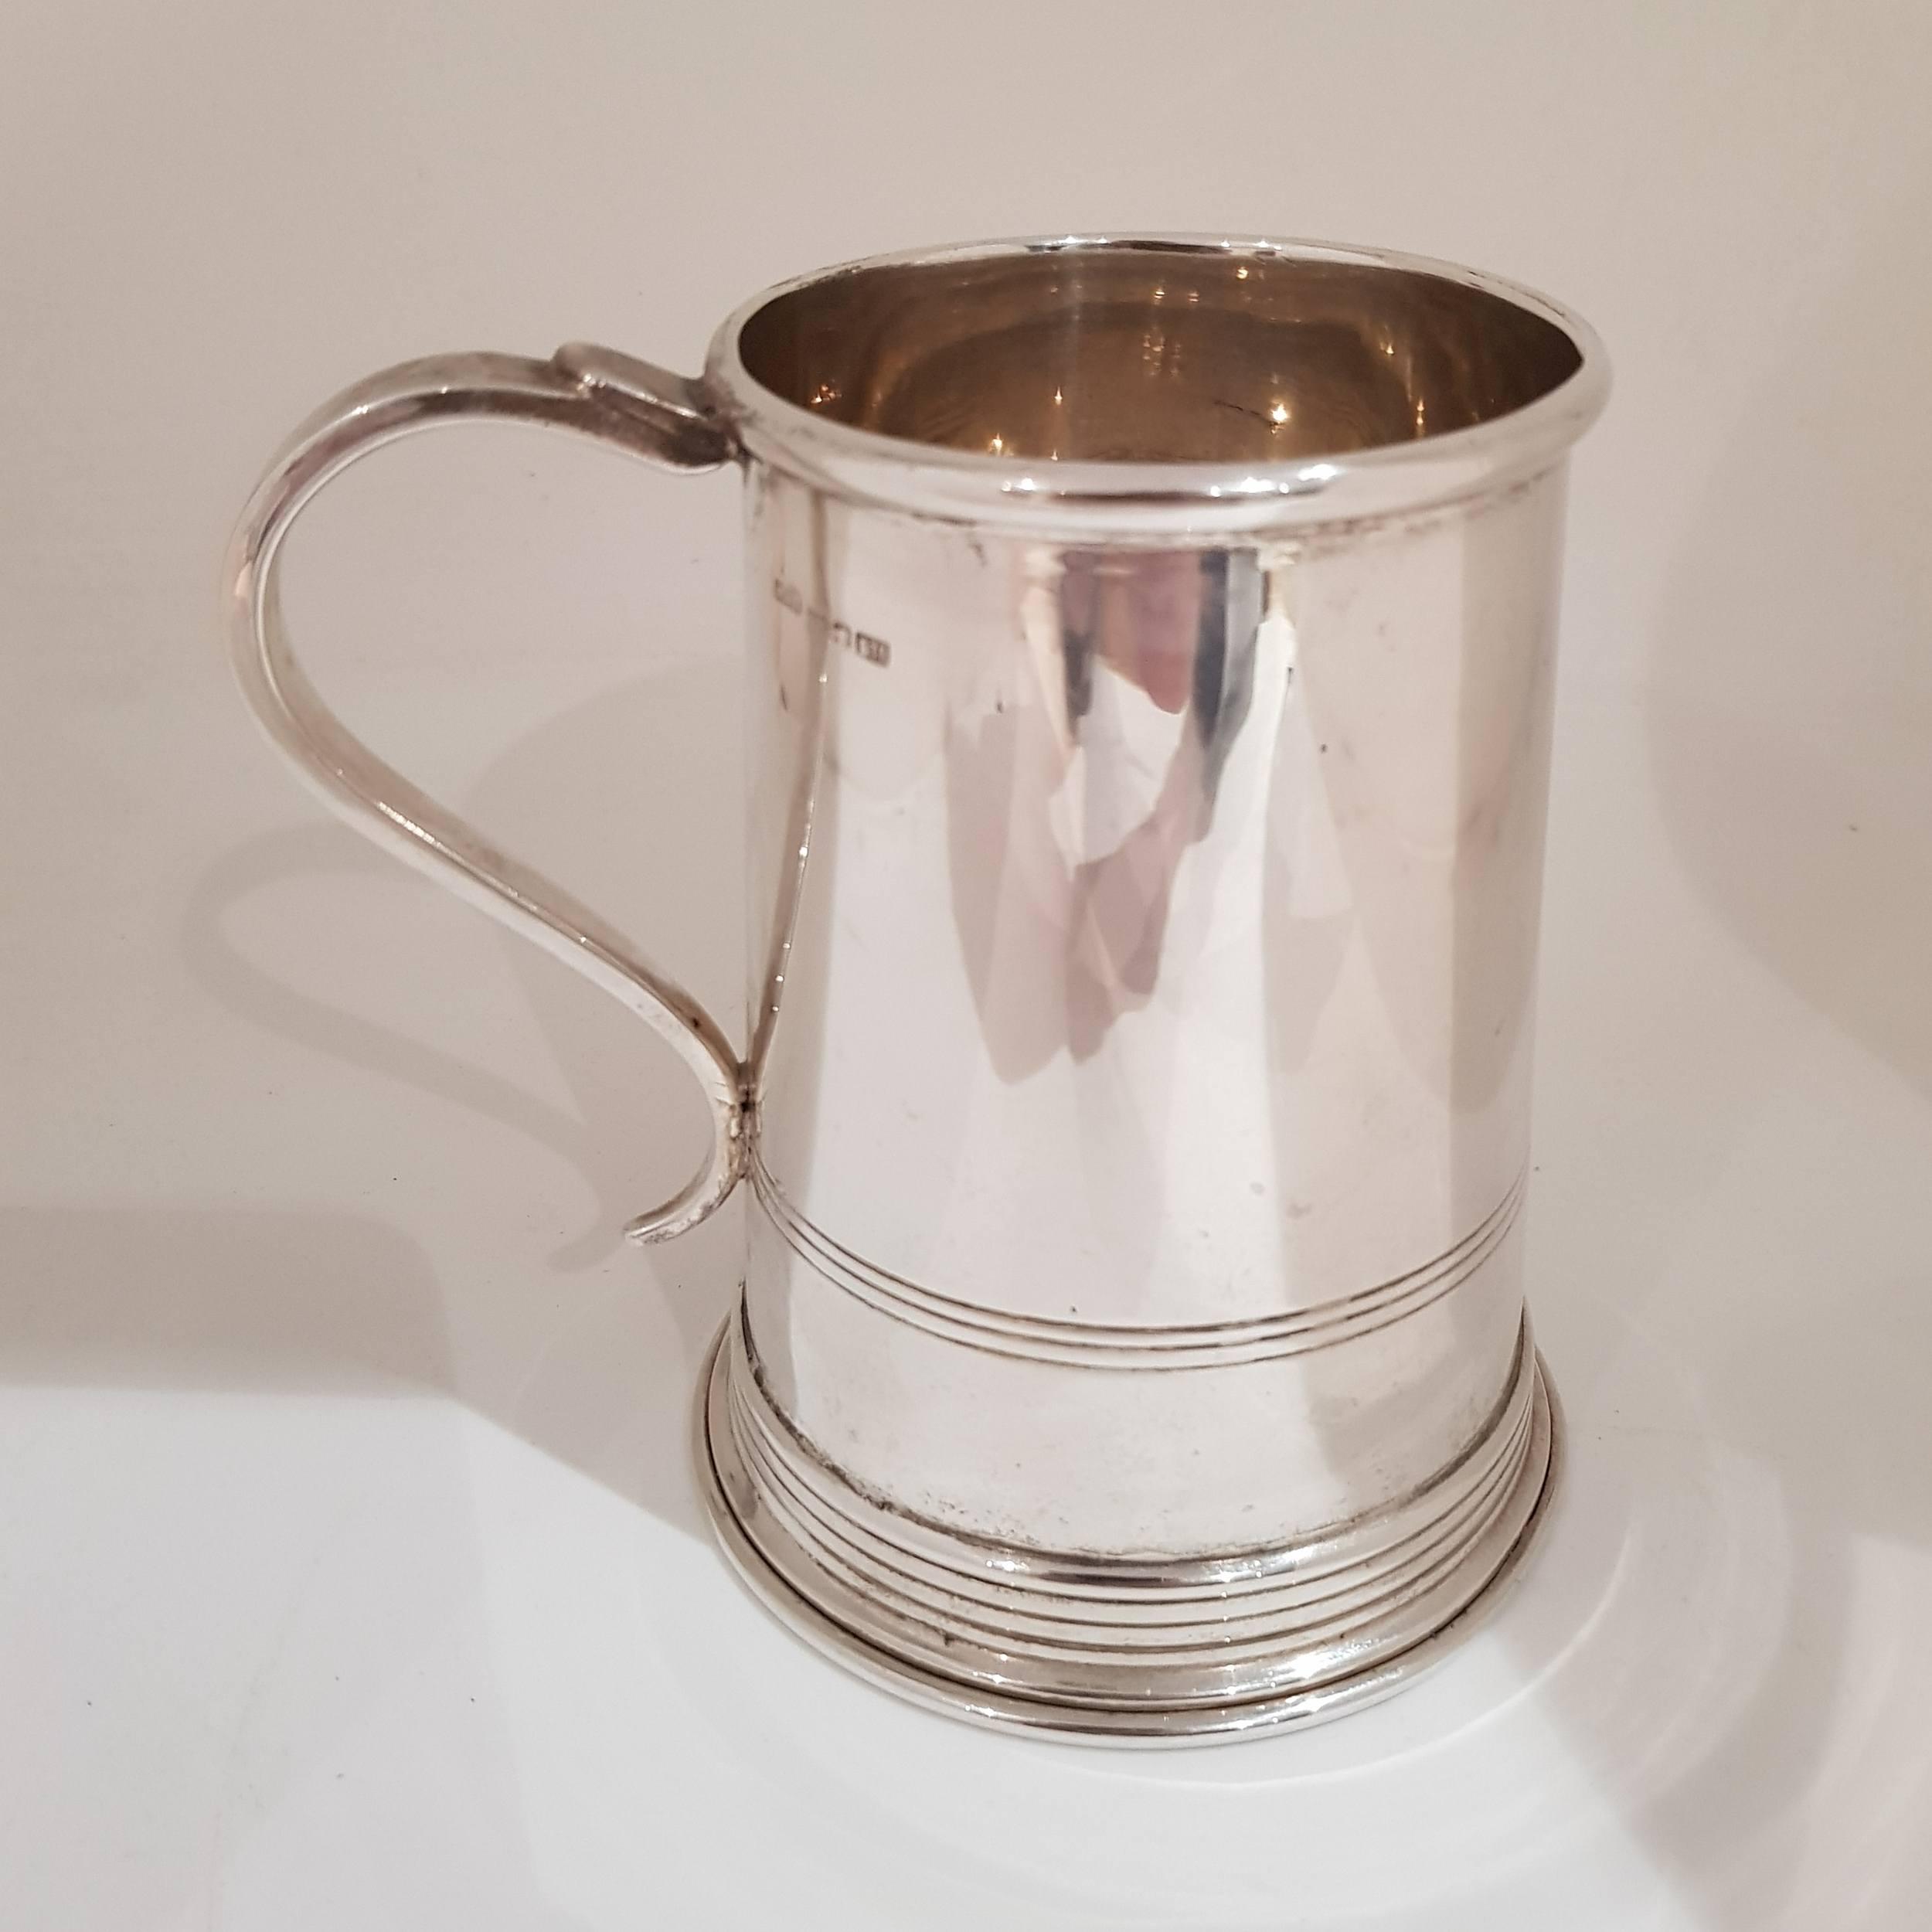 'Australian Sterling Silver Tankard - W.J. Sanders (1885-1946), Sydney, Australia Circa 1914-1942'